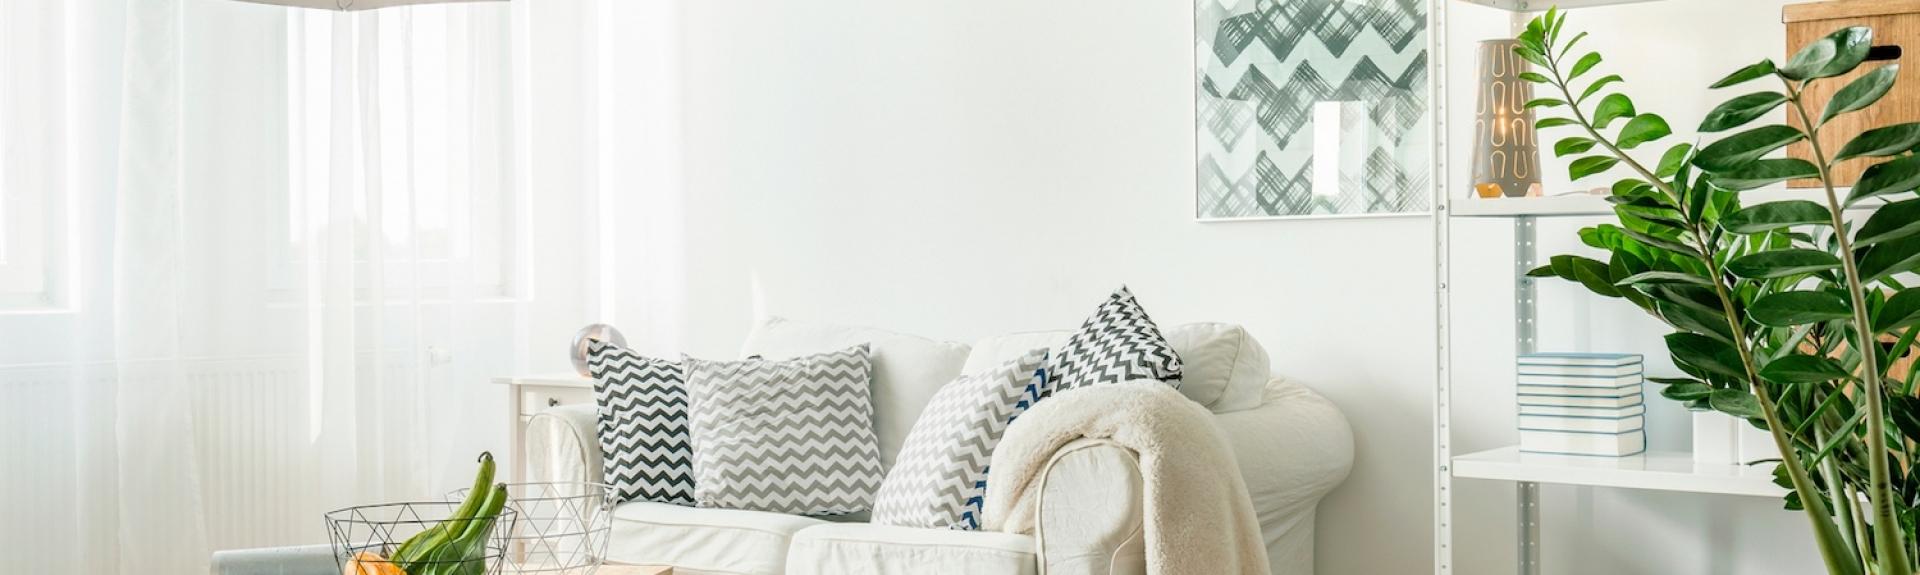 Trendy details in living room